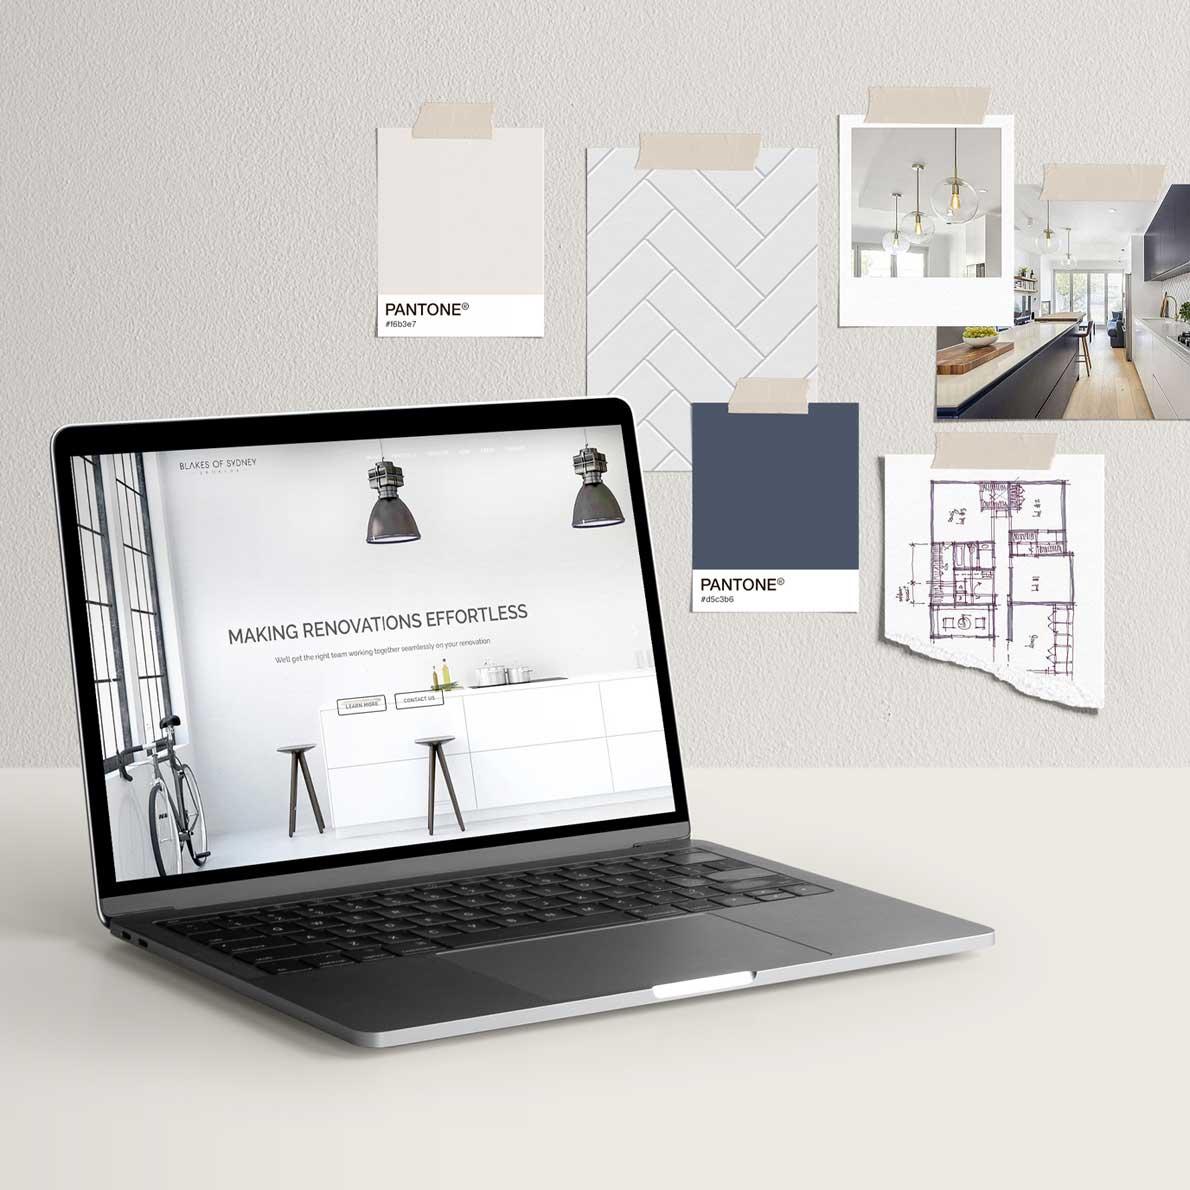 Blakes of Sydney website design by Alphabetsy